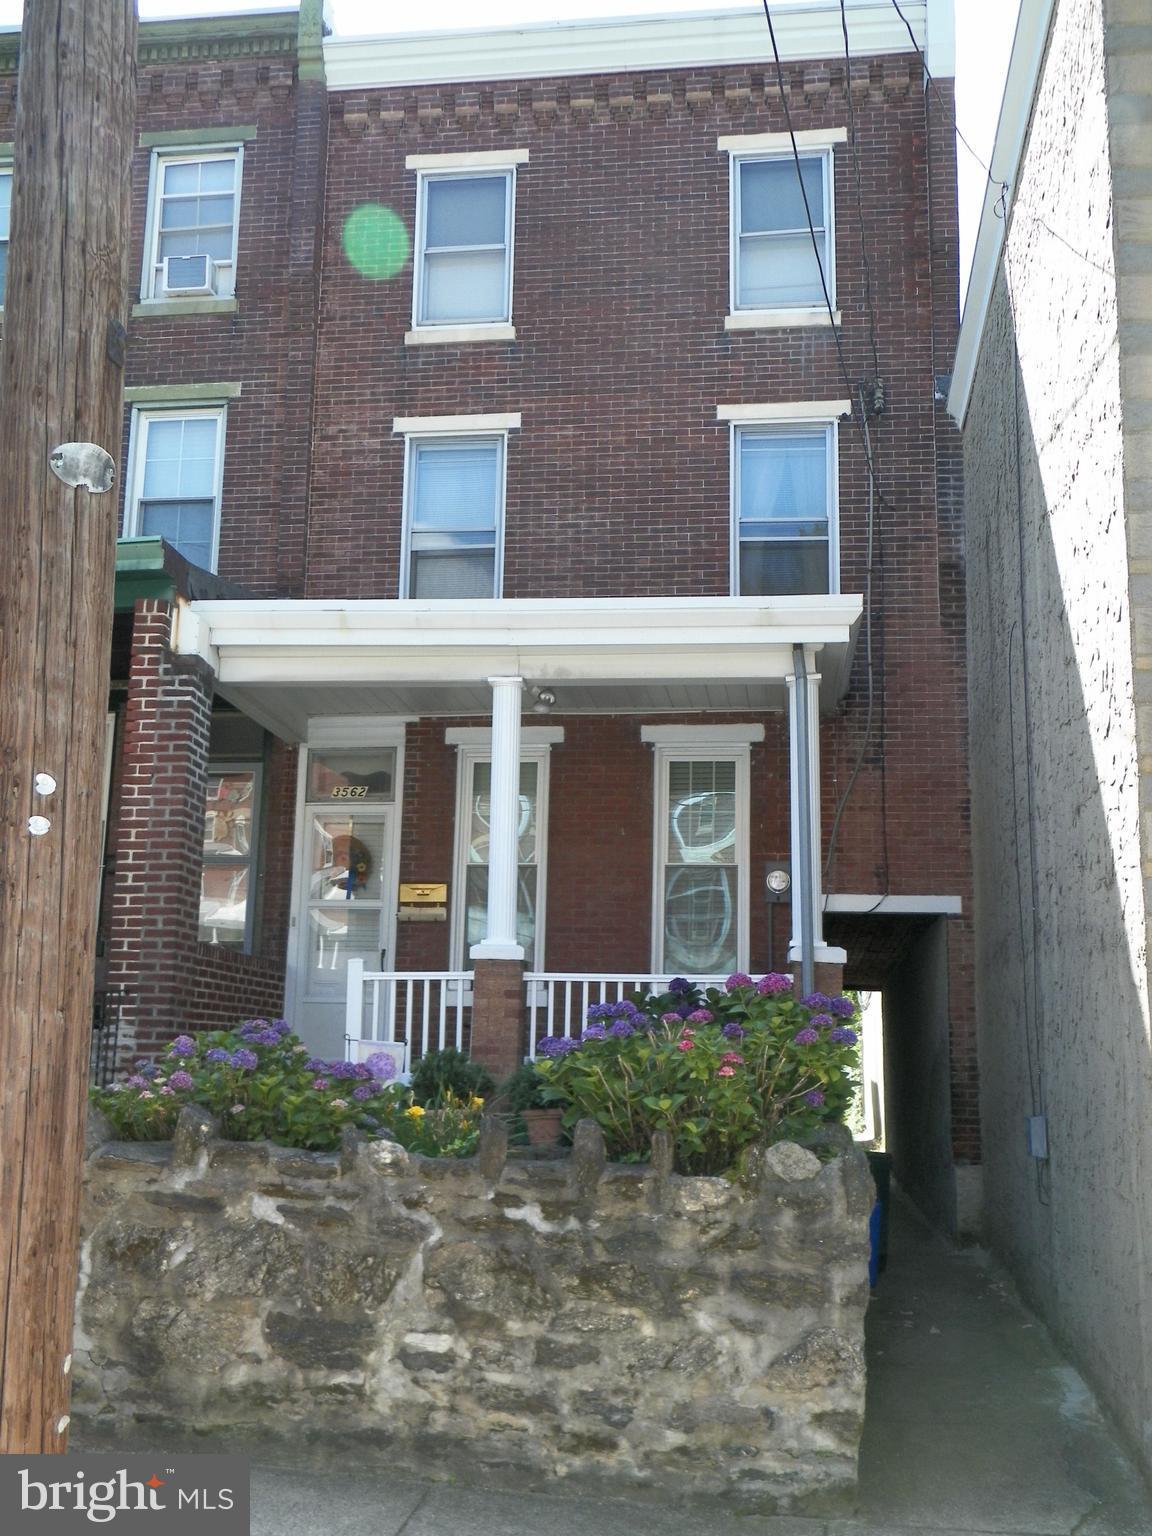 3562 NEW QUEEN STREET, PHILADELPHIA, PA 19129